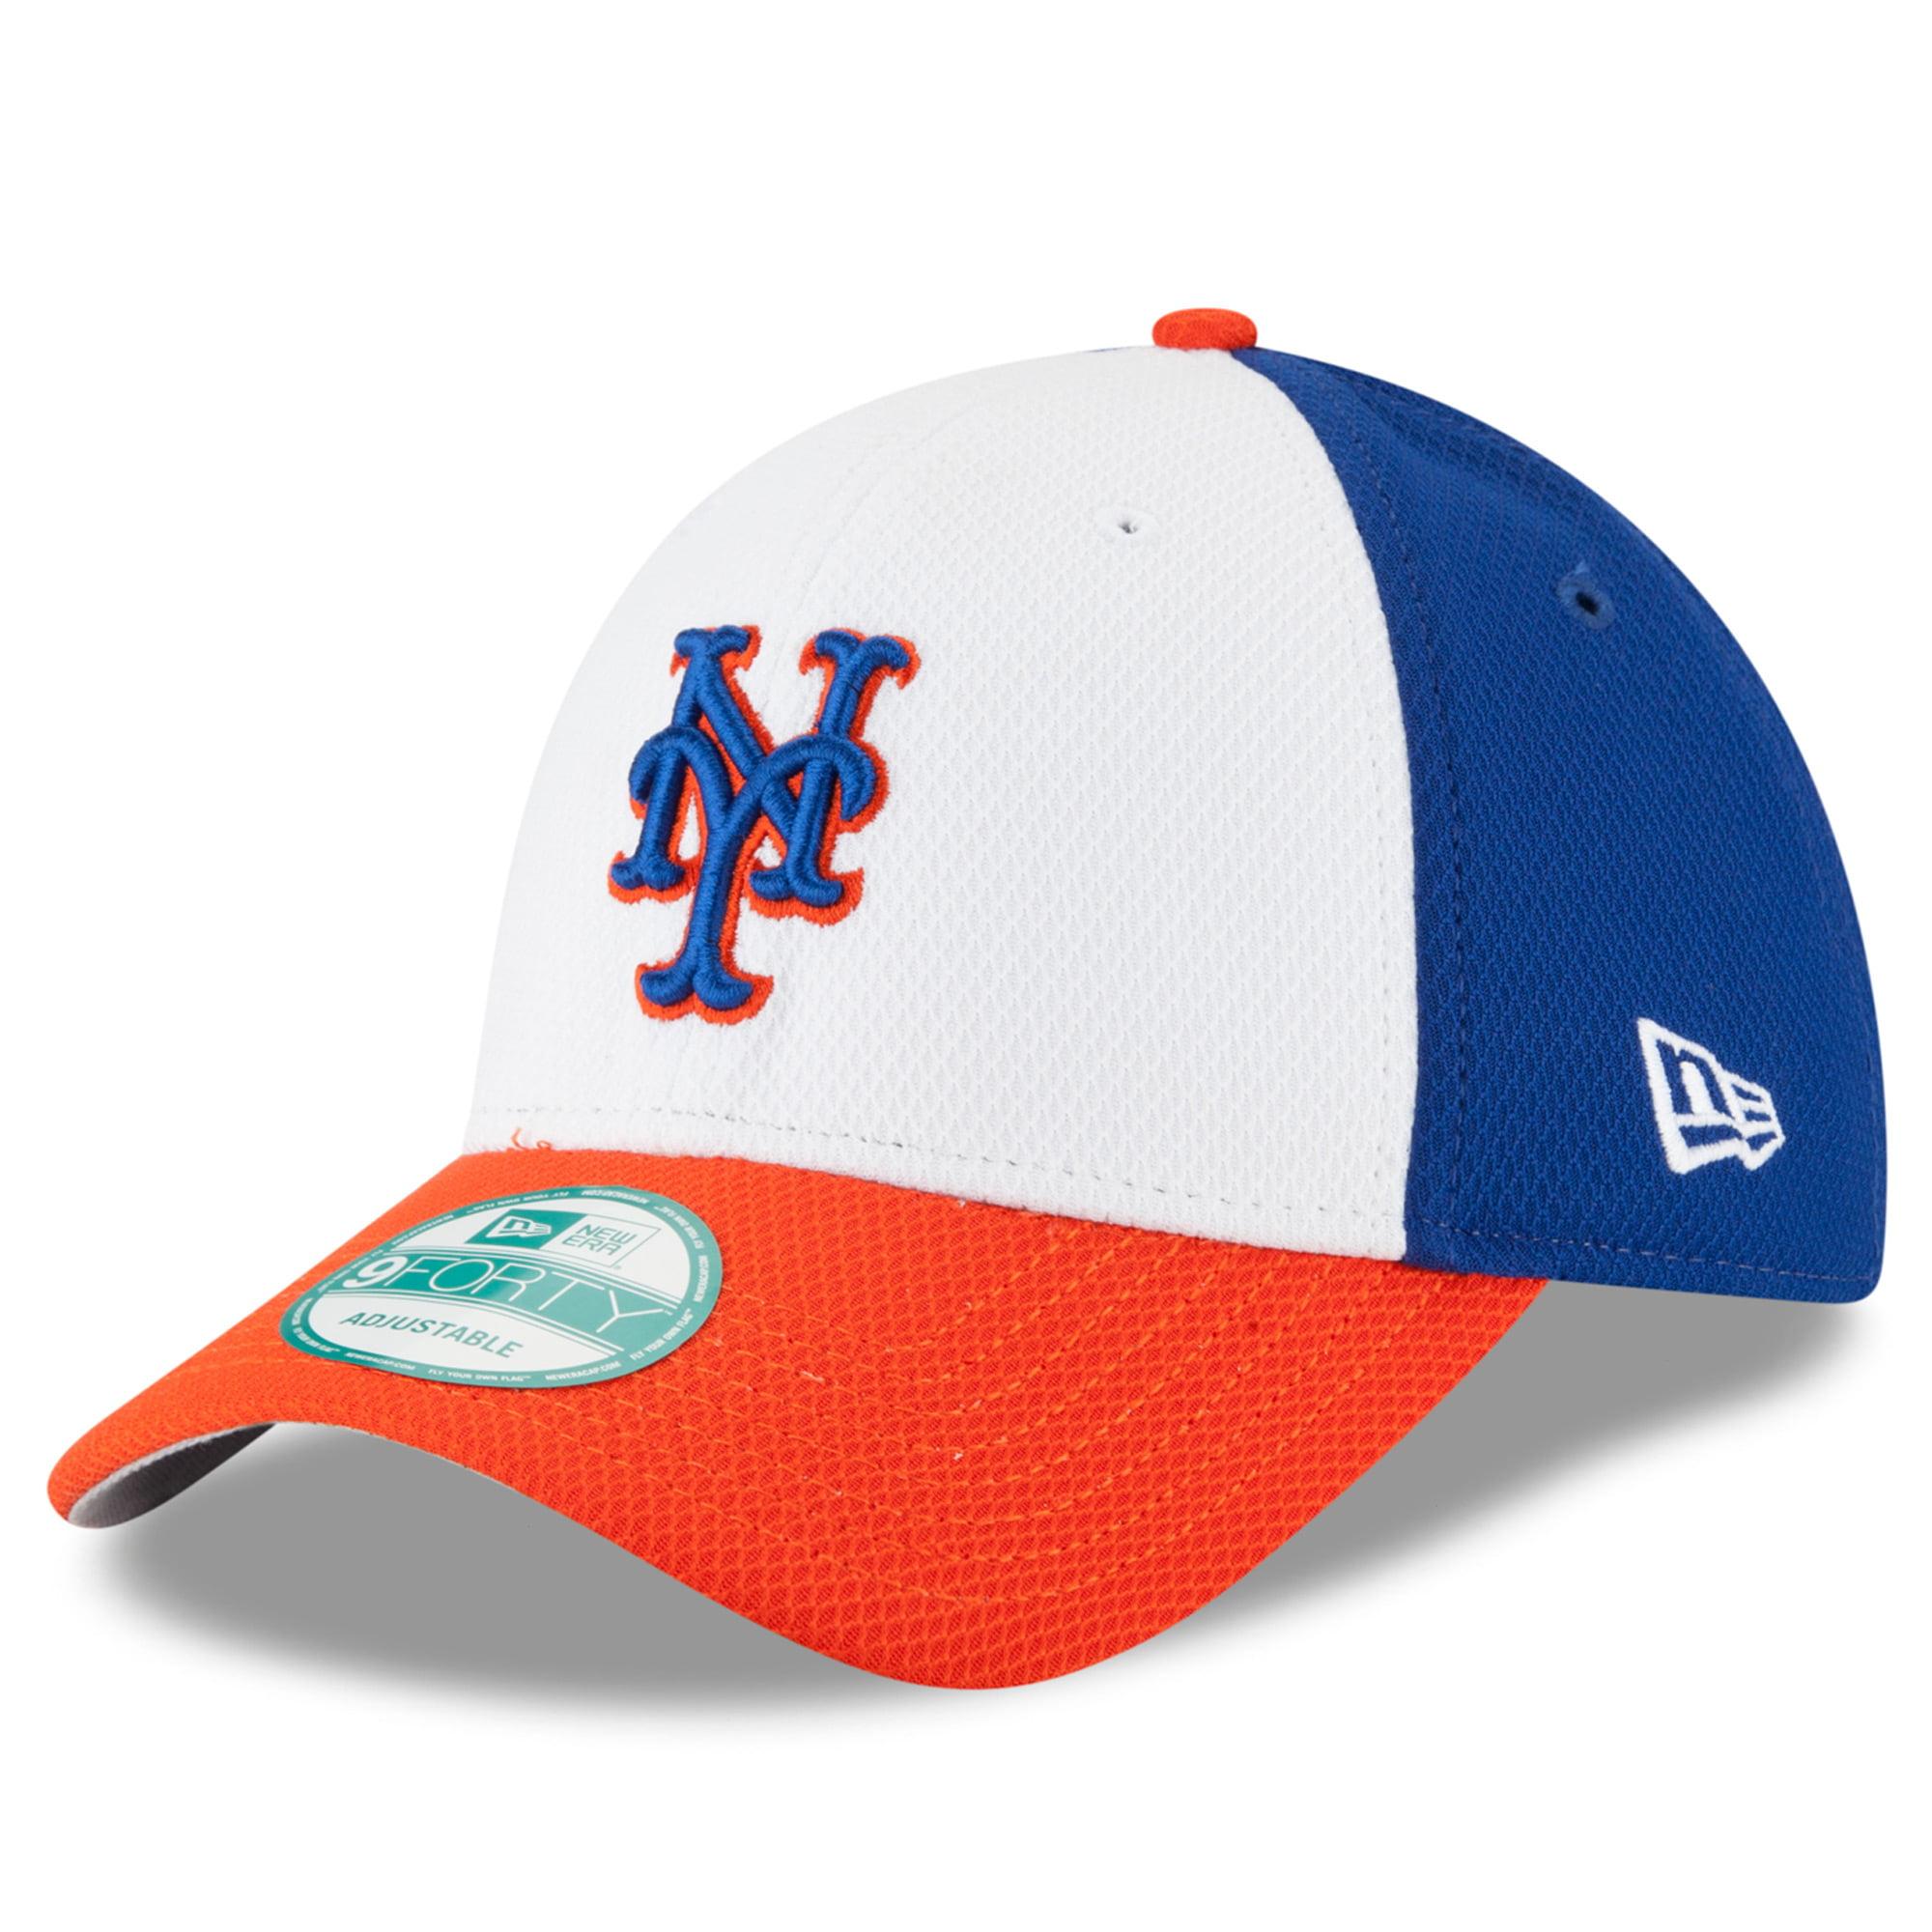 New York Mets New Era Perforated Block 9FORTY Adjustable Hat - White/Orange - OSFA